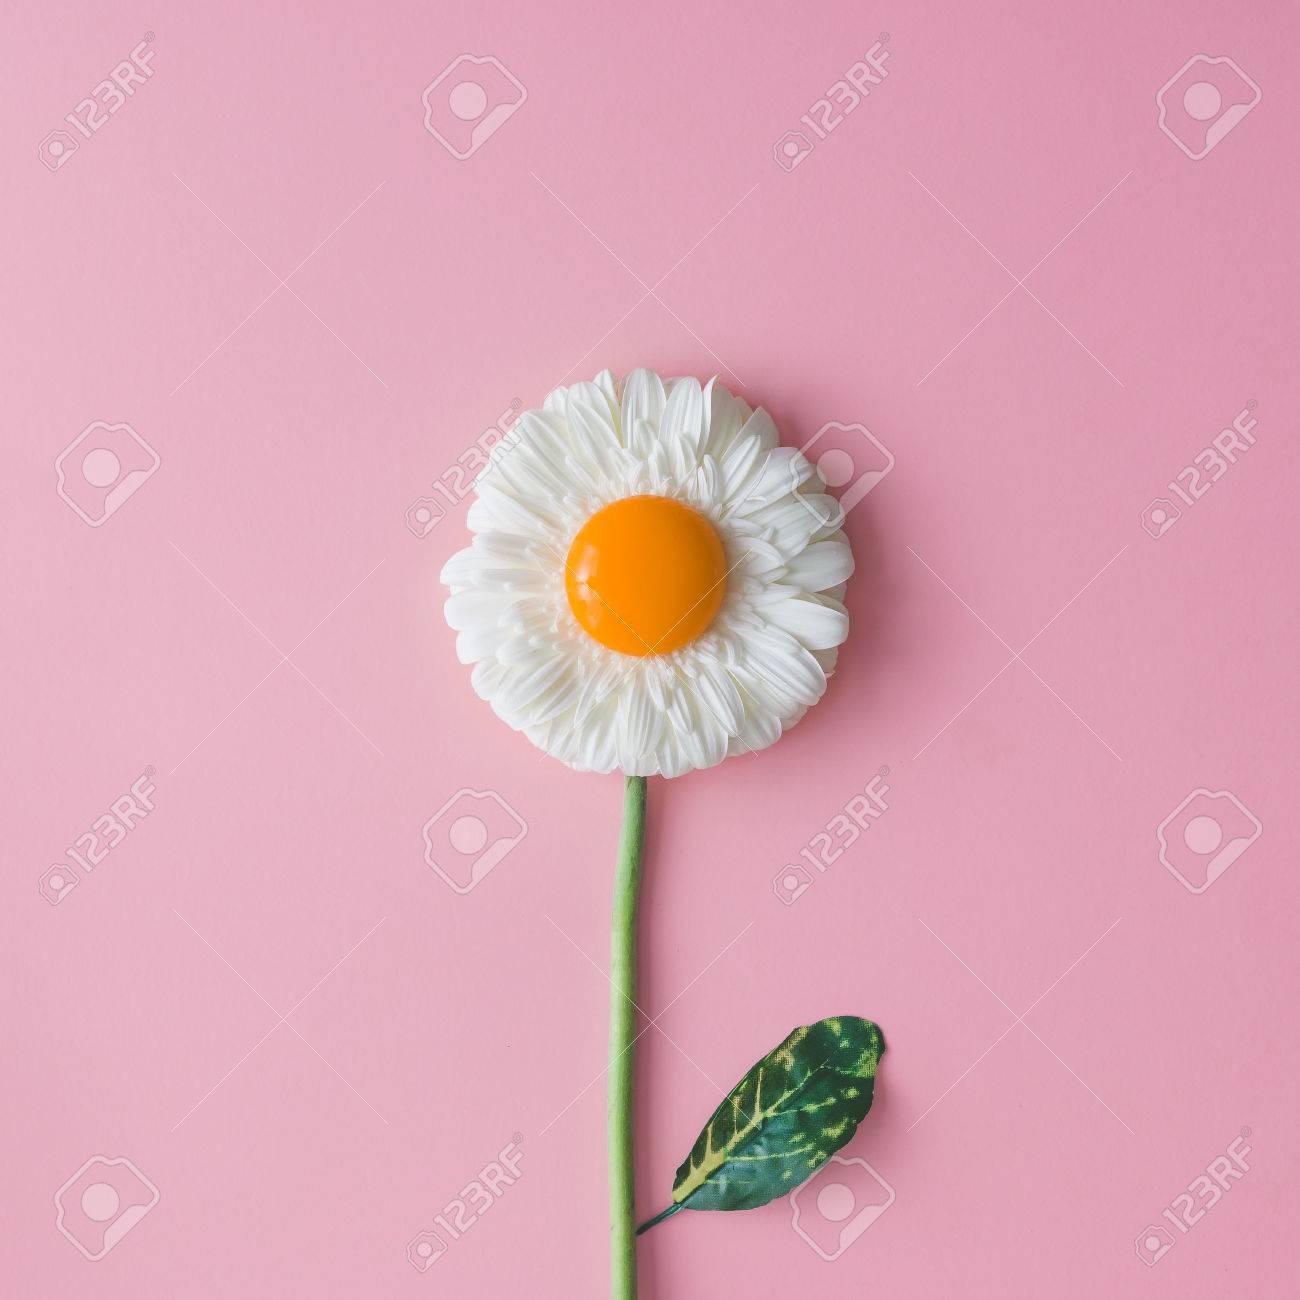 Daisy flower with egg yolk. Minimal concept. Flat lay. - 74236850